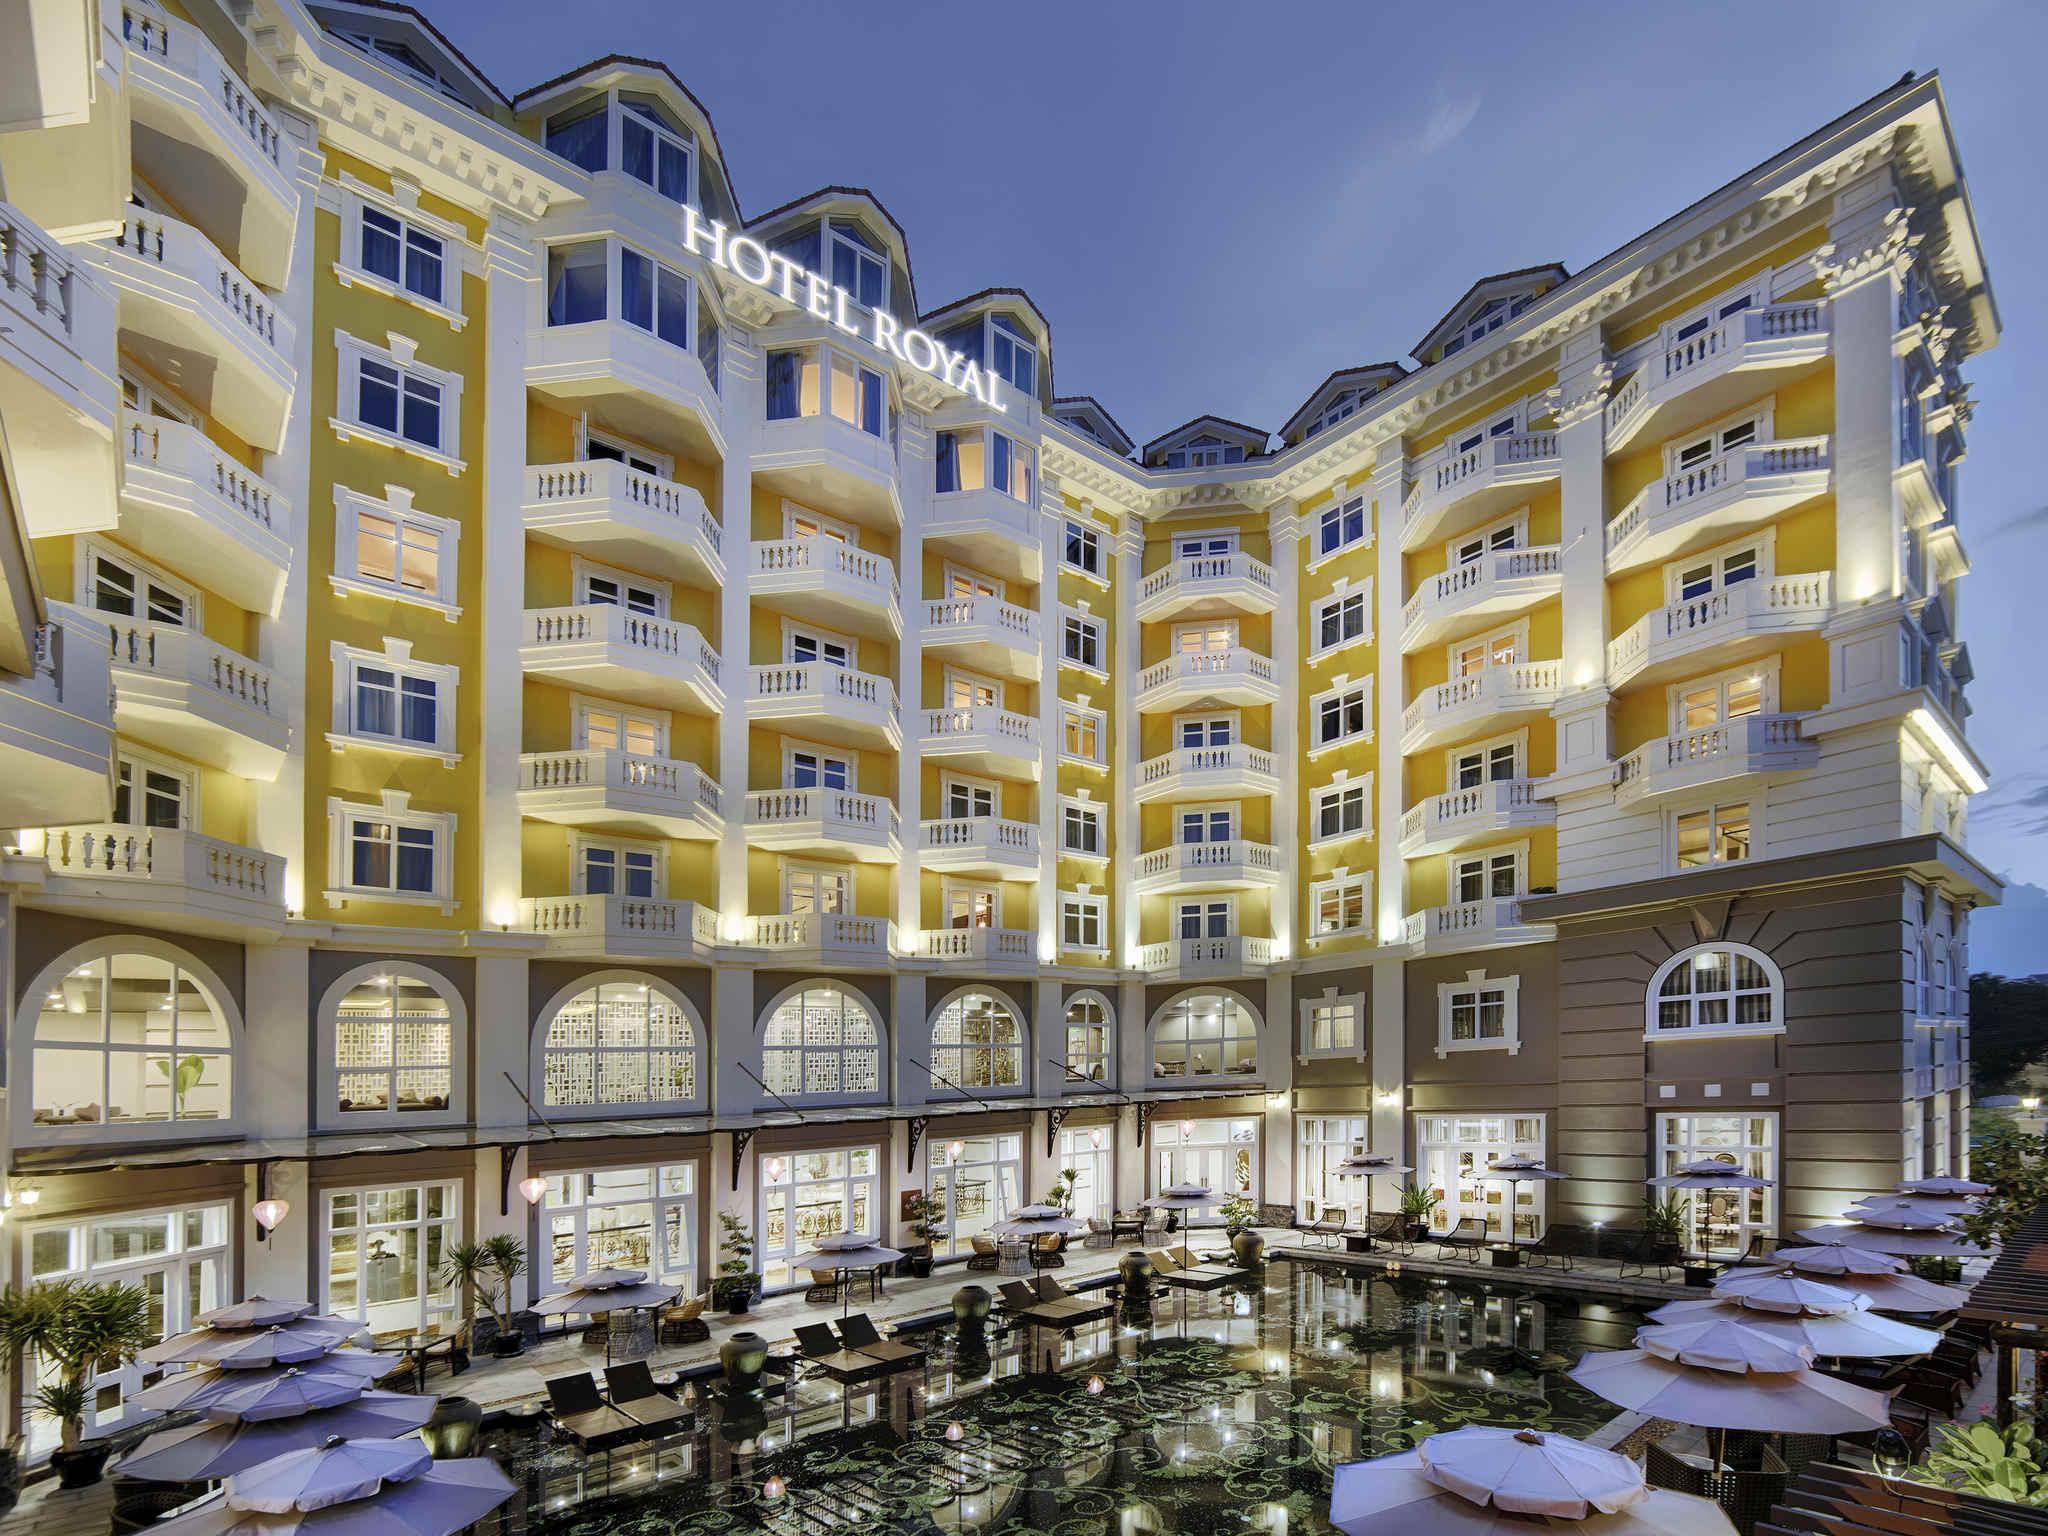 Hotel – Hotel Royal Hoi An - MGallery by Sofitel